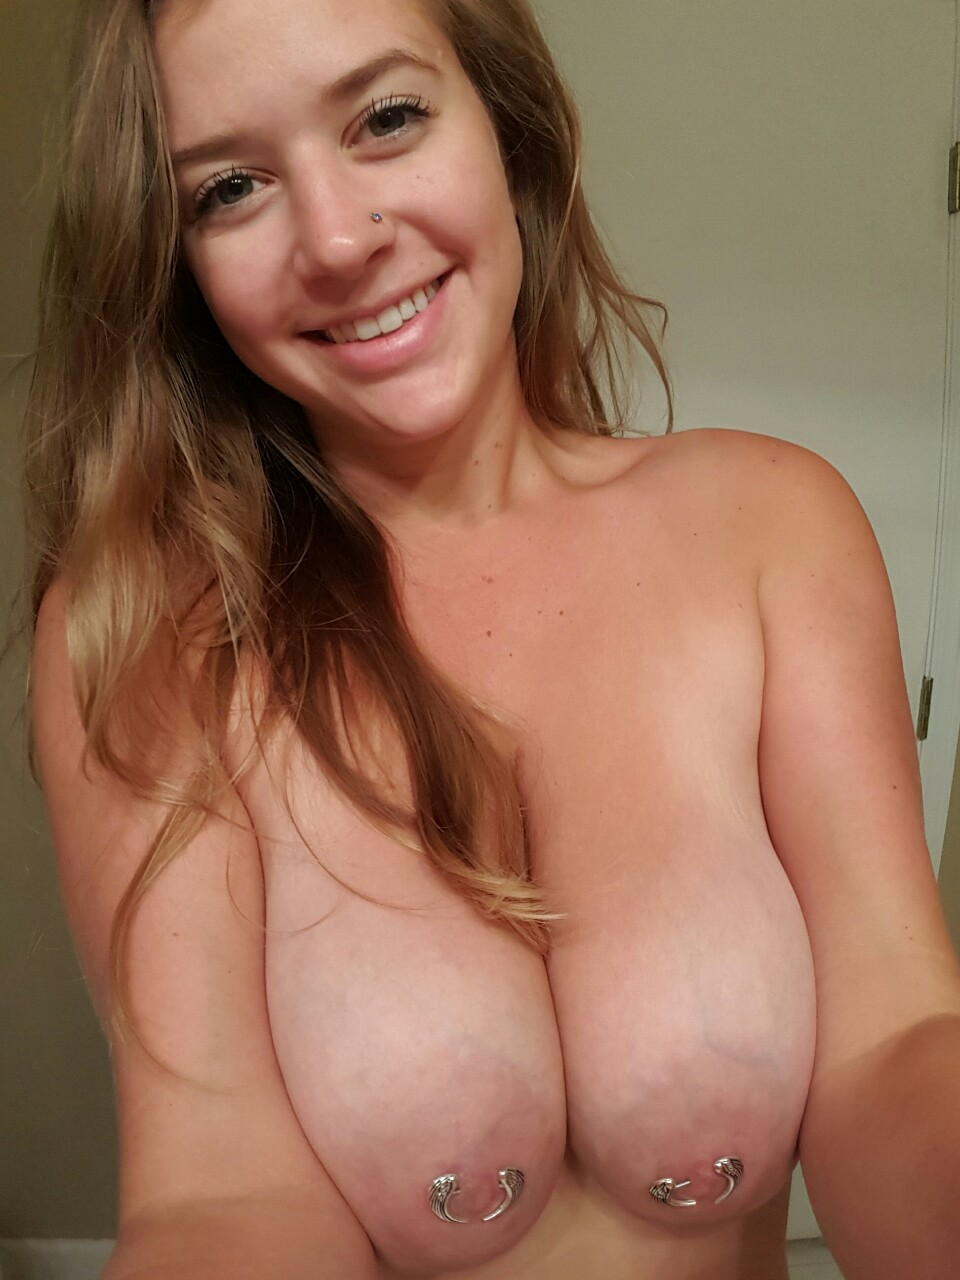 Flat saggy tits tumblr